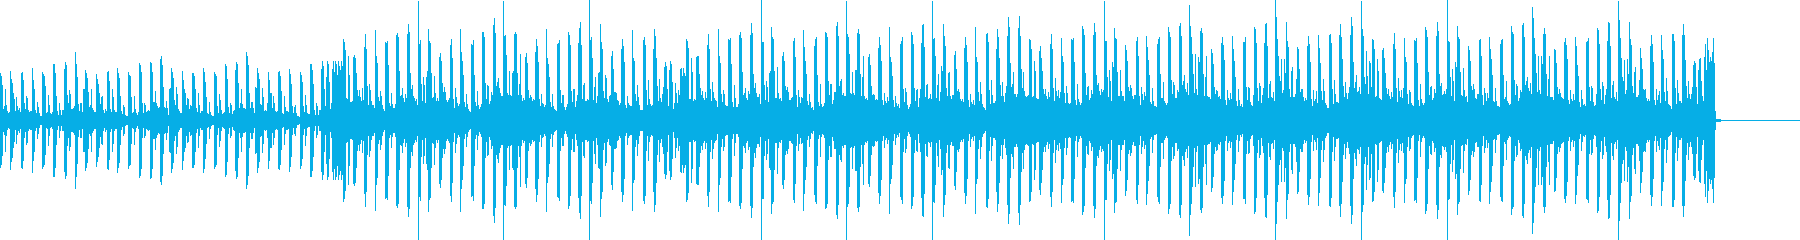 CMや企業VPに最適のハウス系エレクトロの再生済みの波形